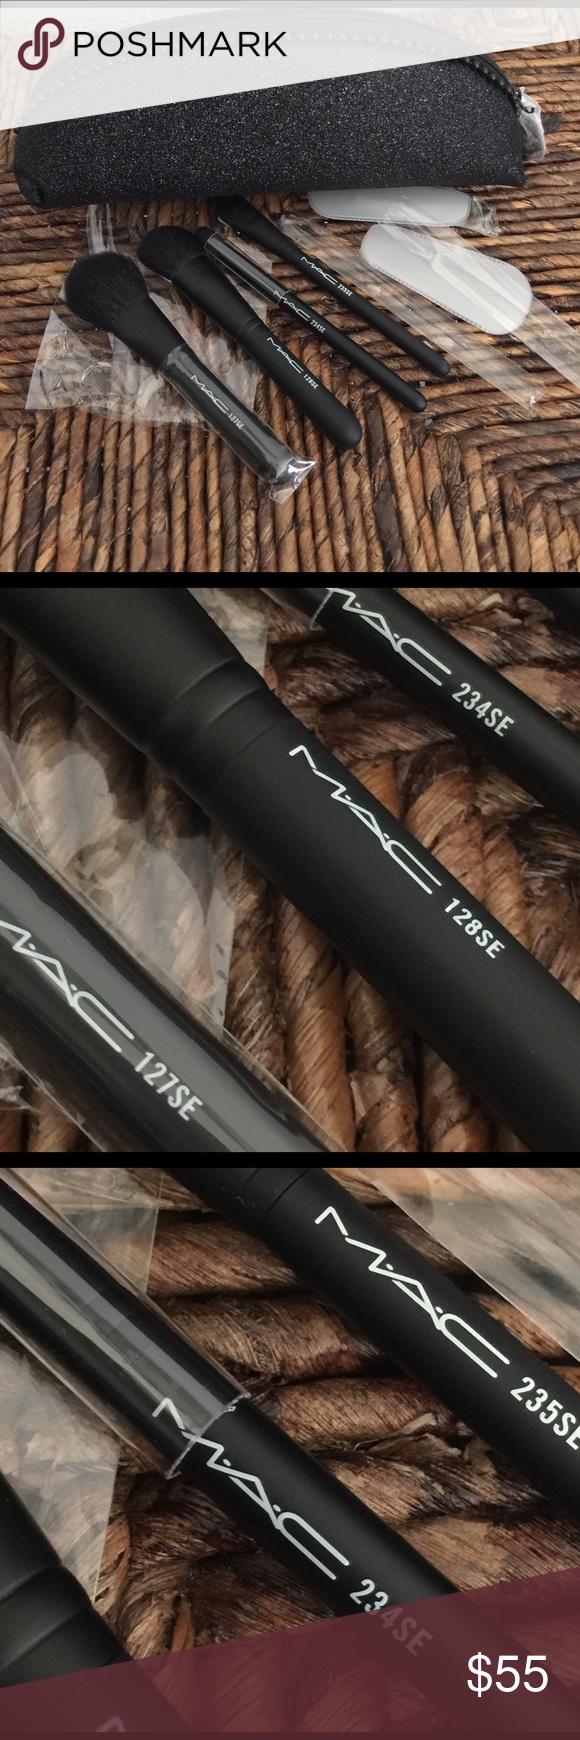 MAC Extra Dimension keepsake Brush collection Travel